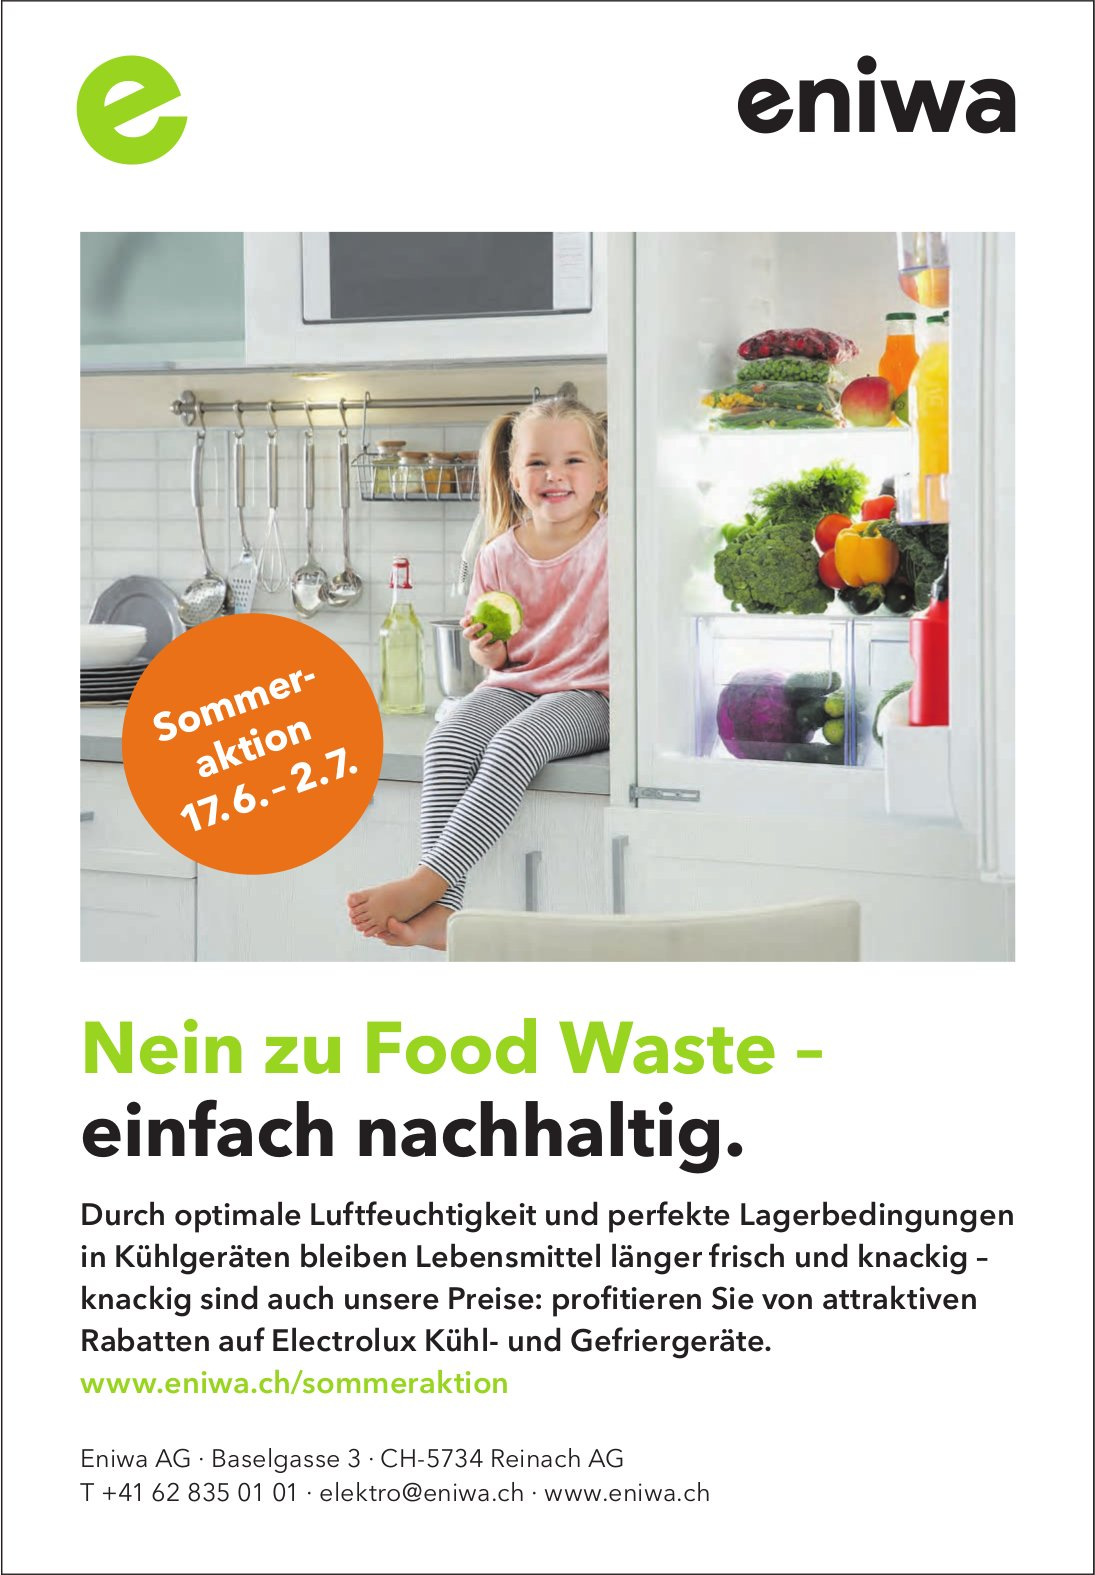 Eniwa AG, Reinach AG - Nein zu Food Waste – einfach nachhaltig.